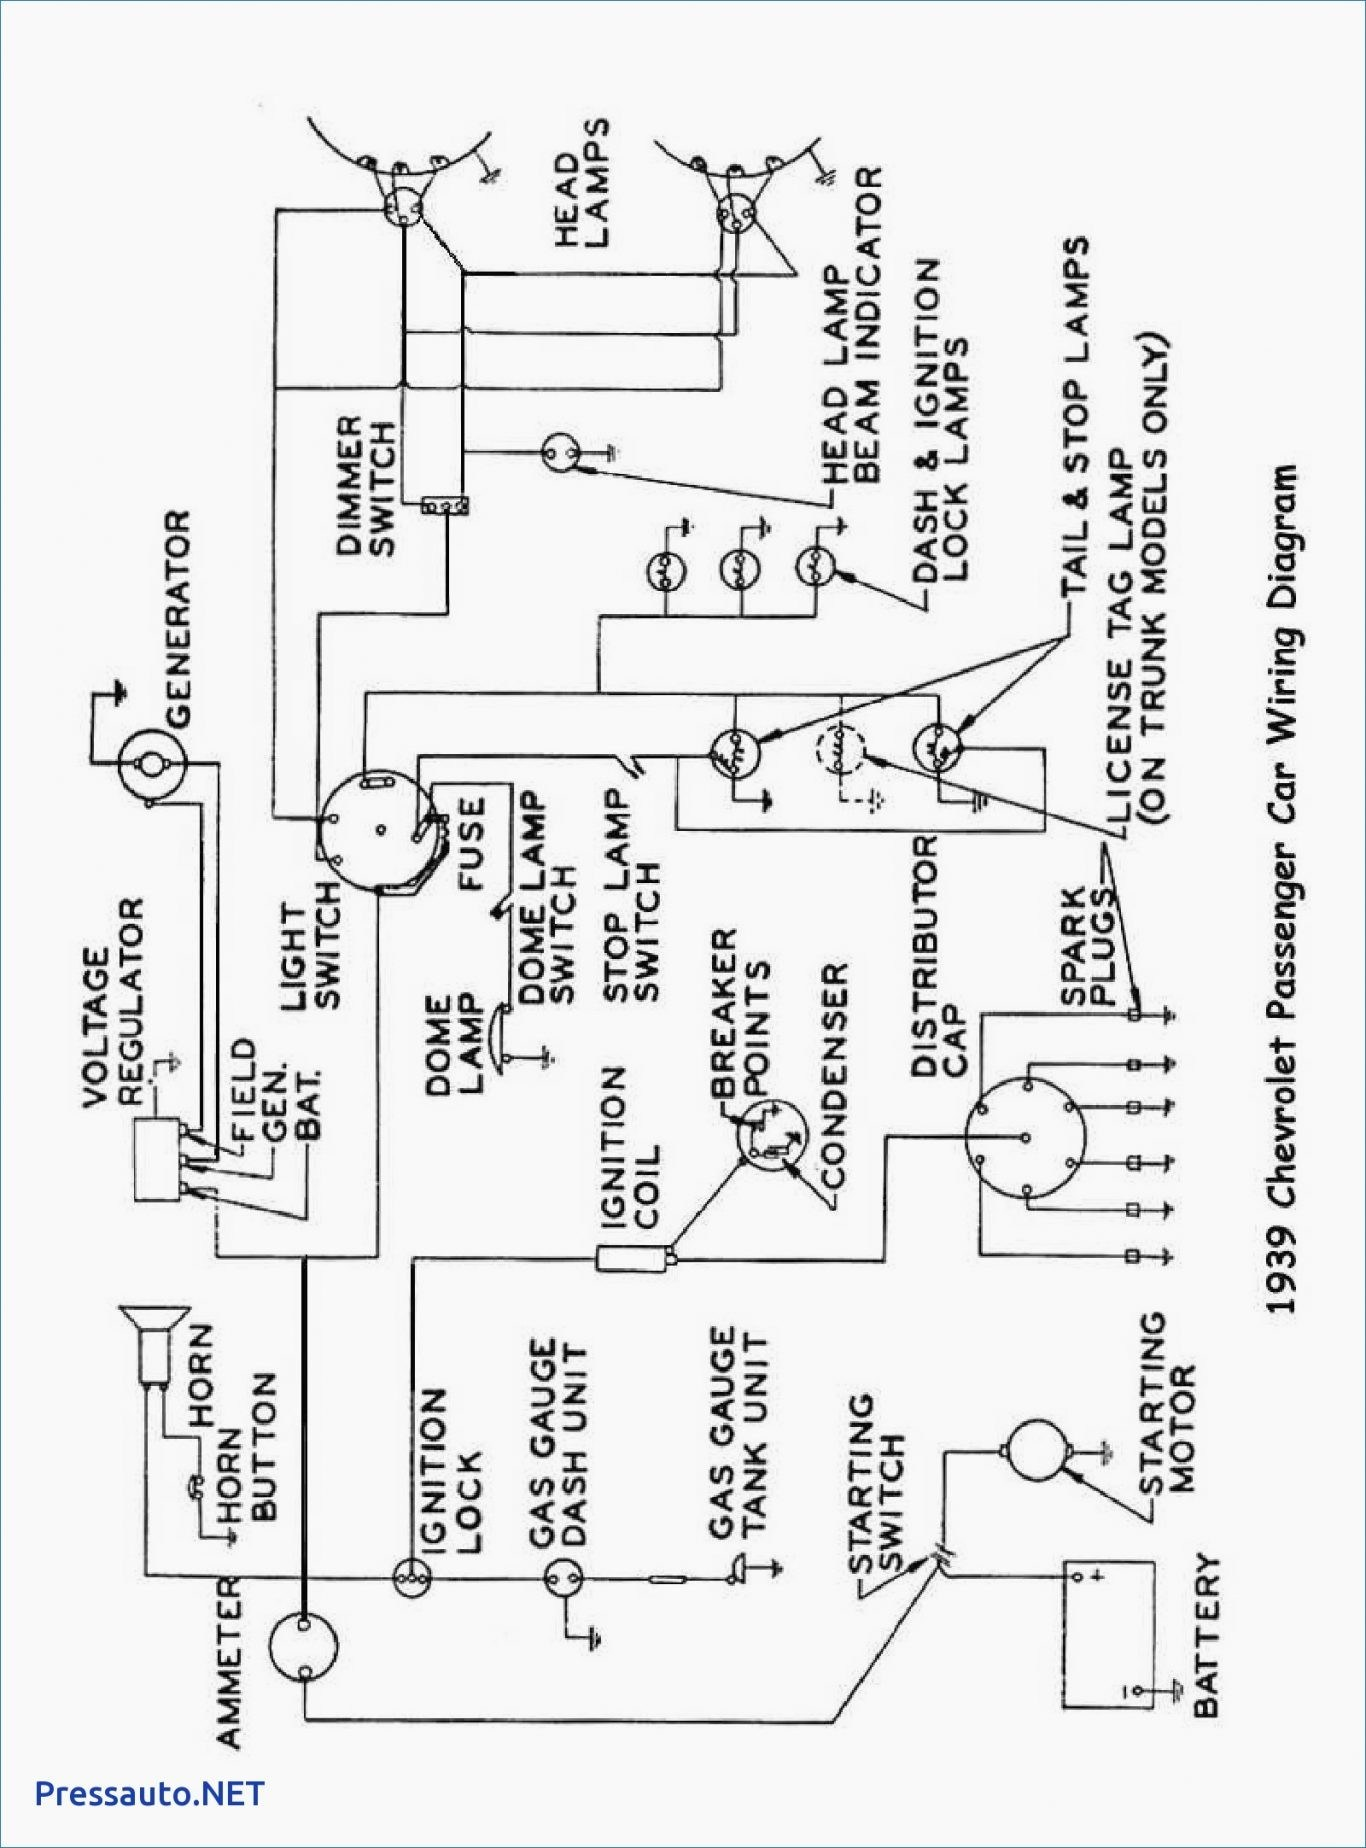 Mm John Deere 310c Backhoe Wiring Diagram John